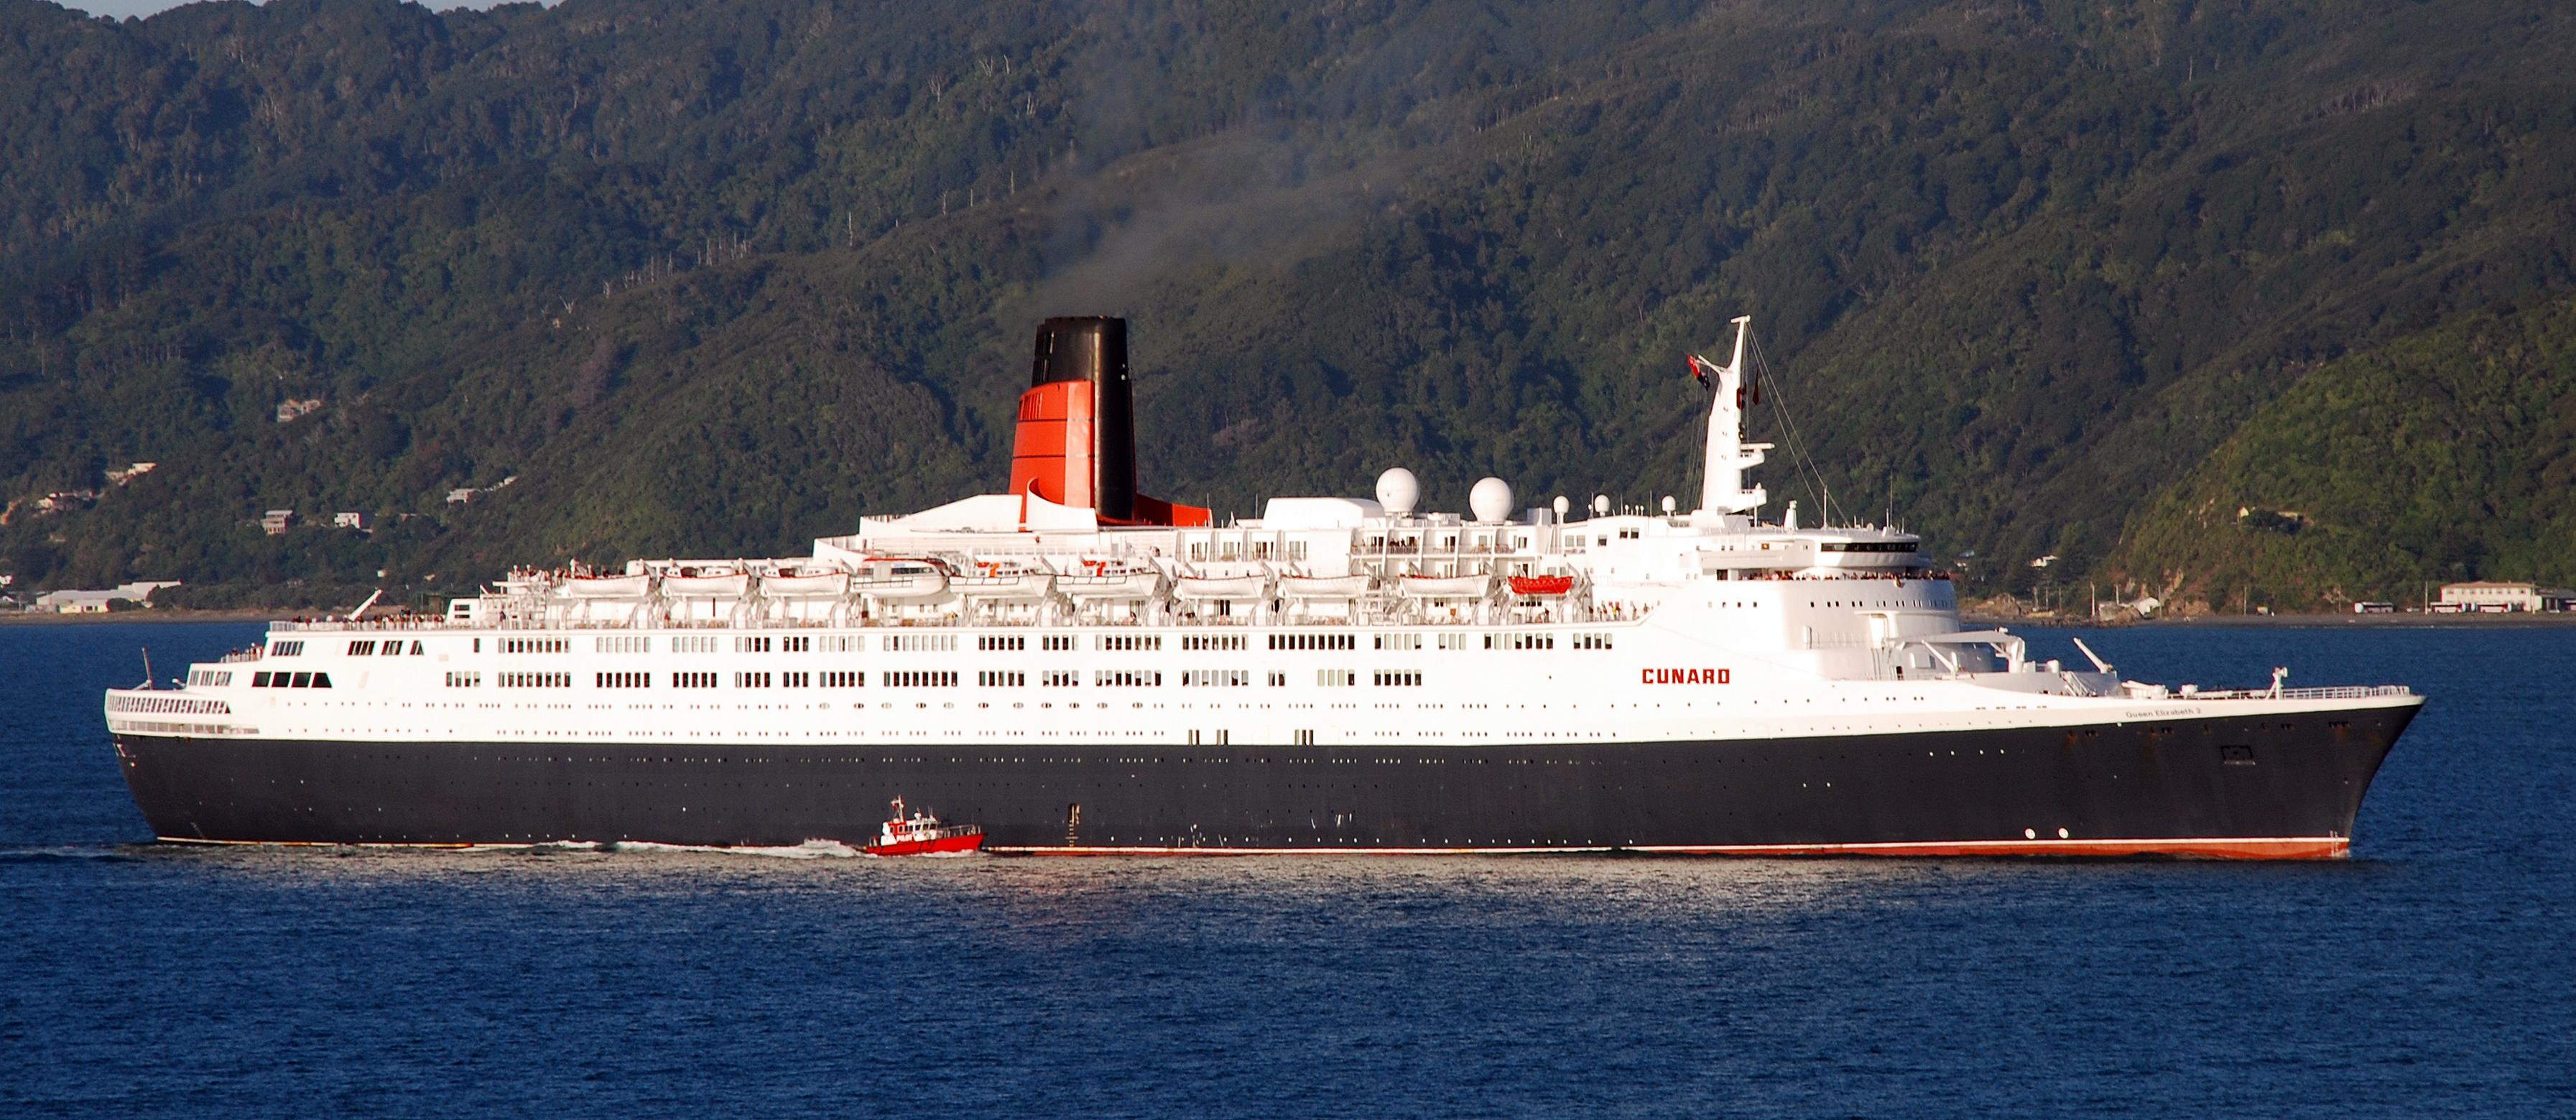 FileQueen Elizabeth Ship Jpg Wikimedia Commons - Queen elizabeth cruise ship wikipedia